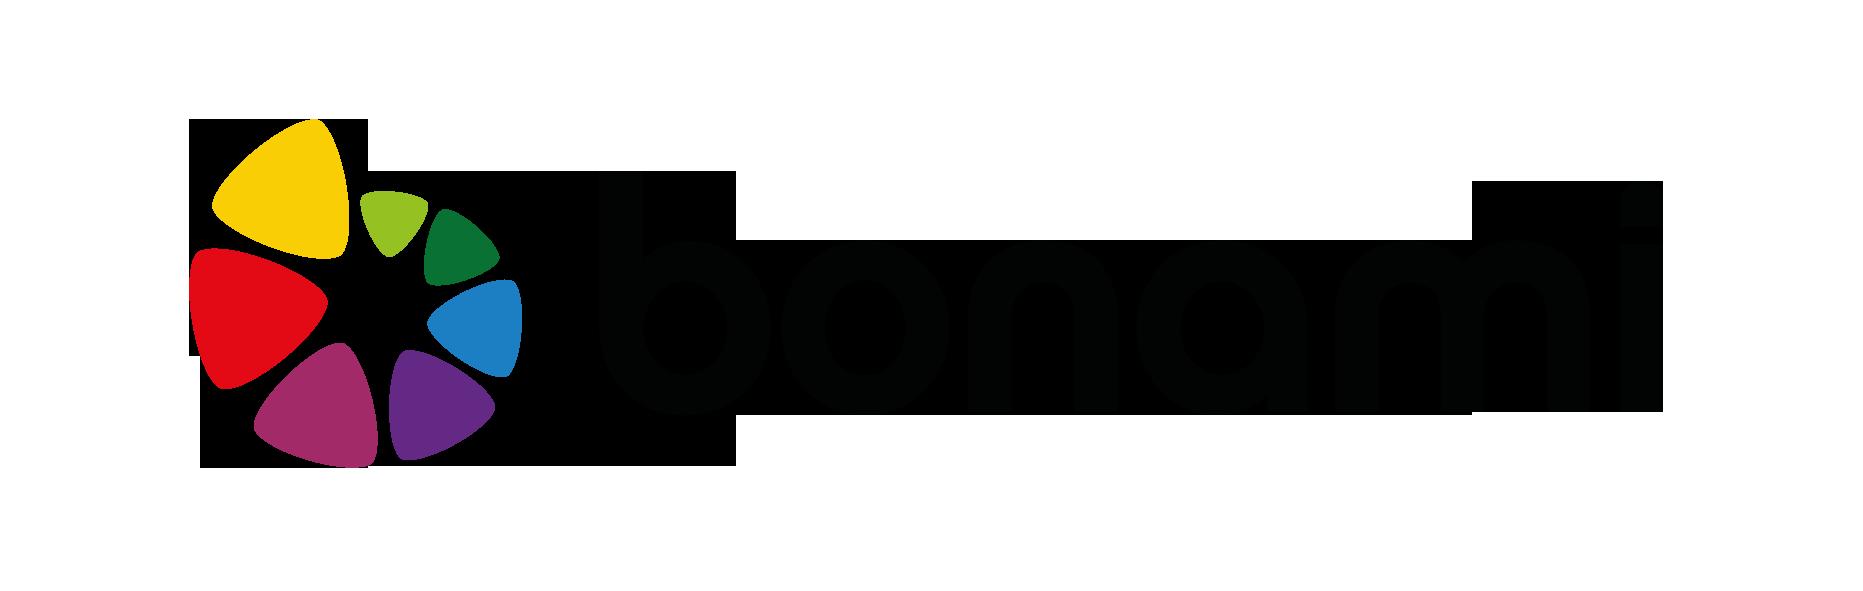 Bonami.cz